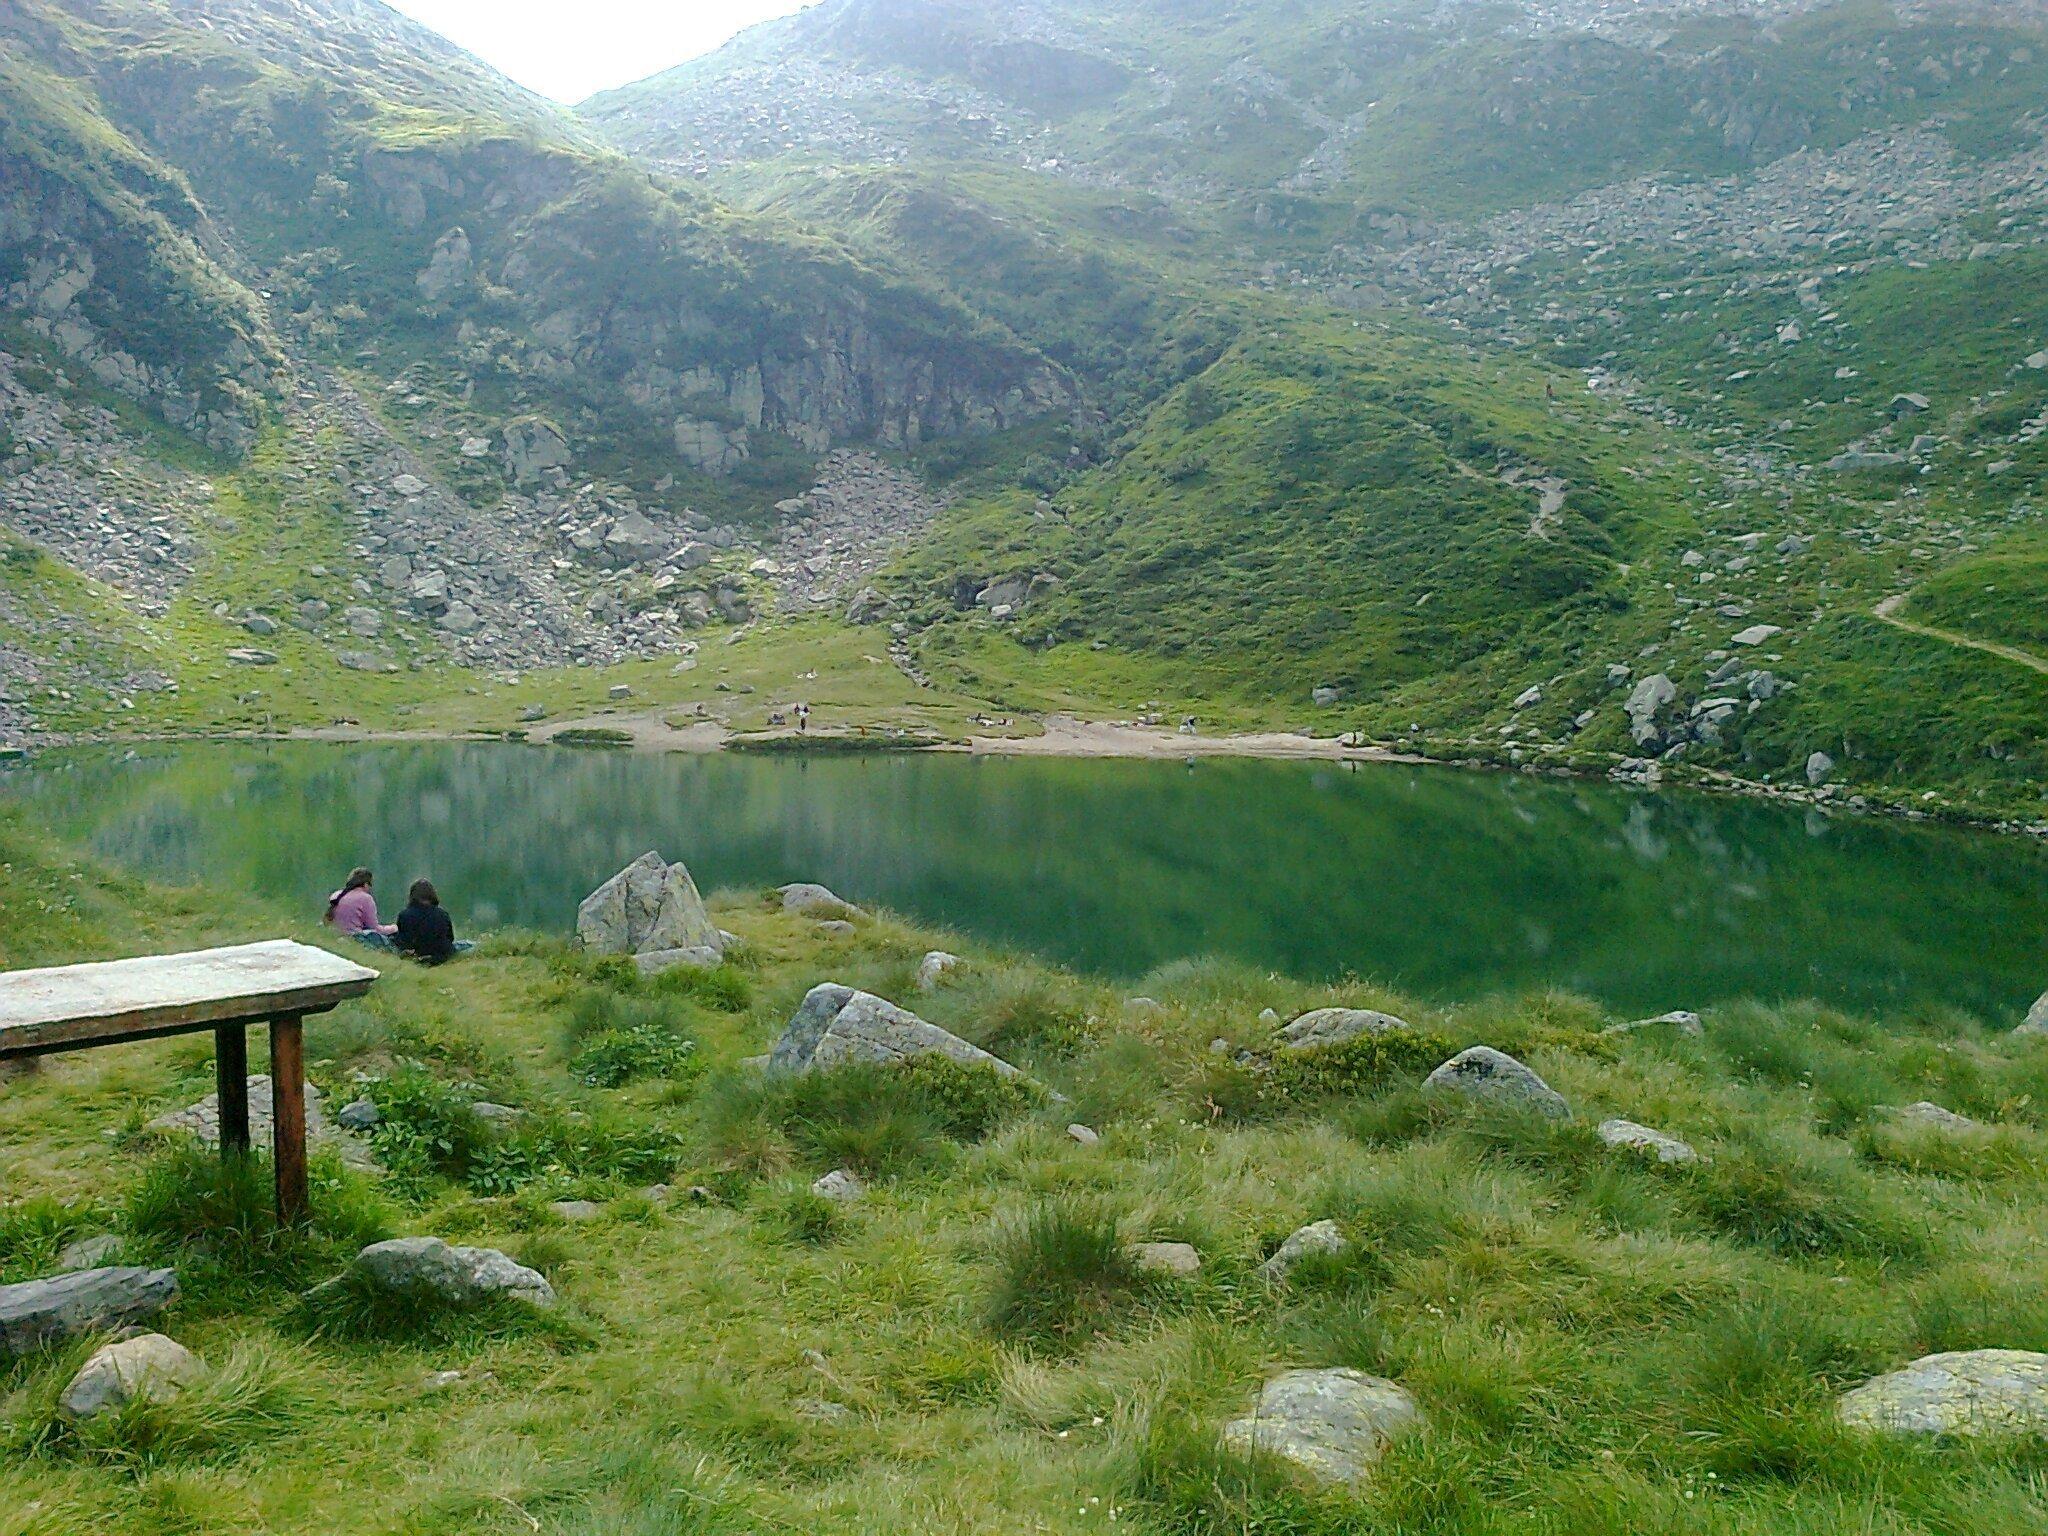 a lake in the mountains 7 1440x1080 - A lake in the mountains